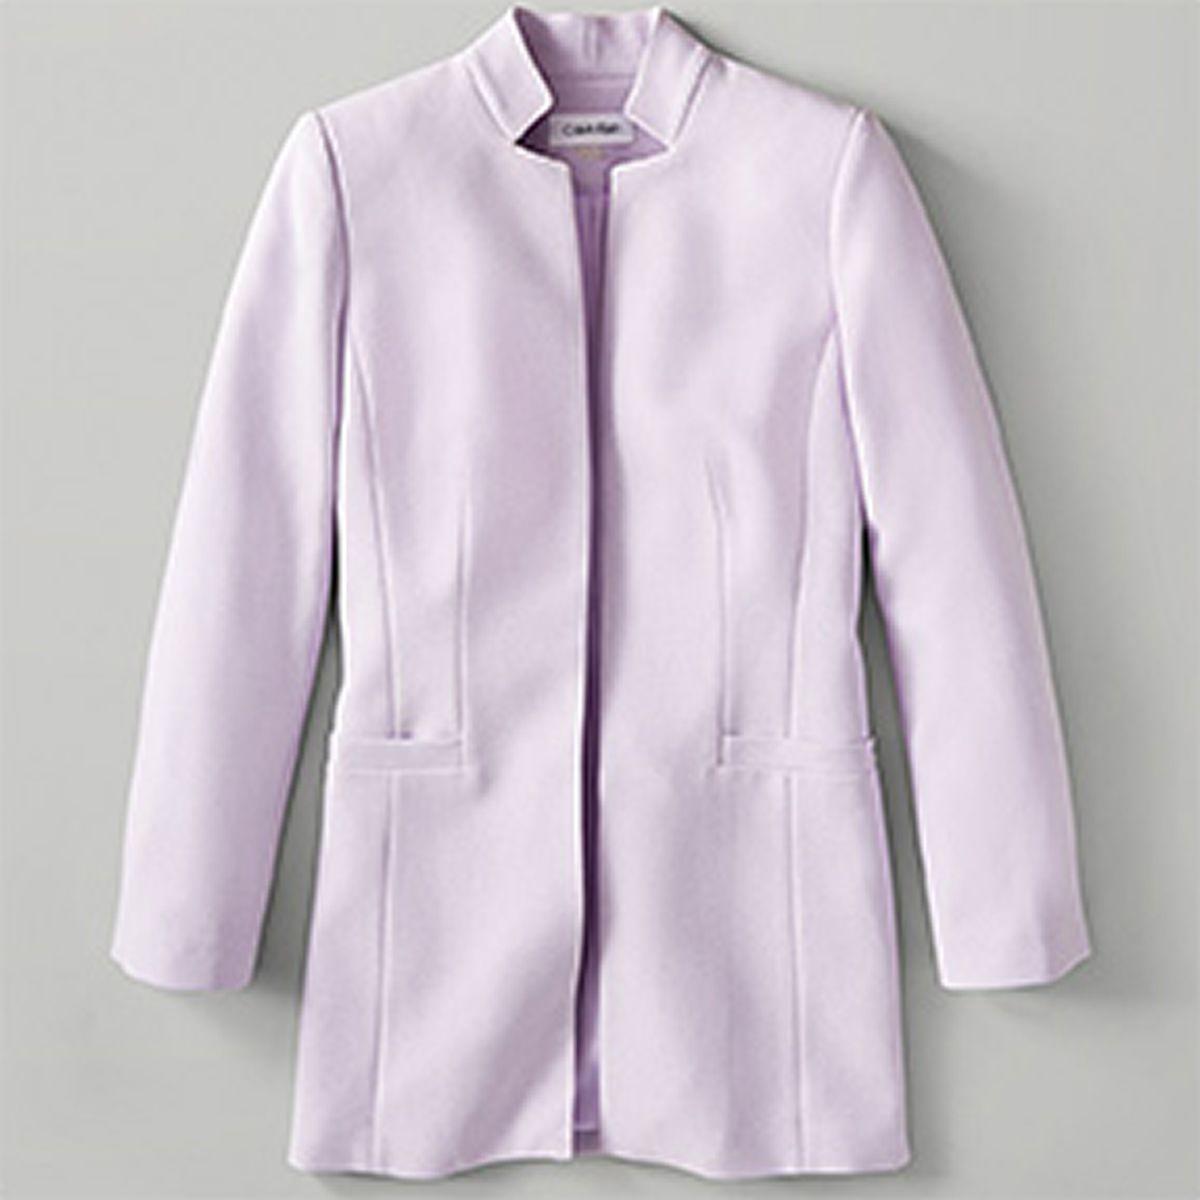 9beea7f8c769b Women s Clothing and Fashion - Macy s